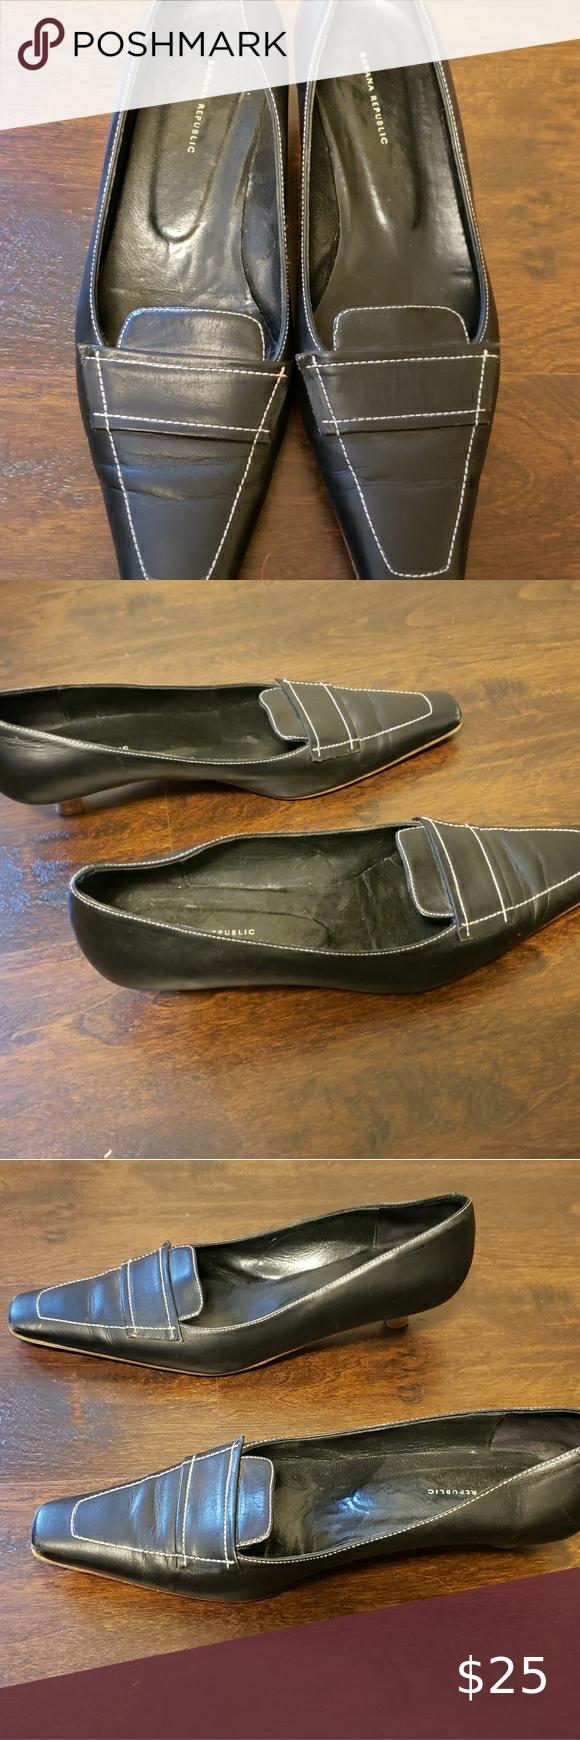 Banana Republic Women Black Dress Shoe Great Condition Very Comfortable Dress Shoe Small Heel Comfortable Dress Shoes Black Dress Shoe Shoes Women Heels [ 1740 x 580 Pixel ]